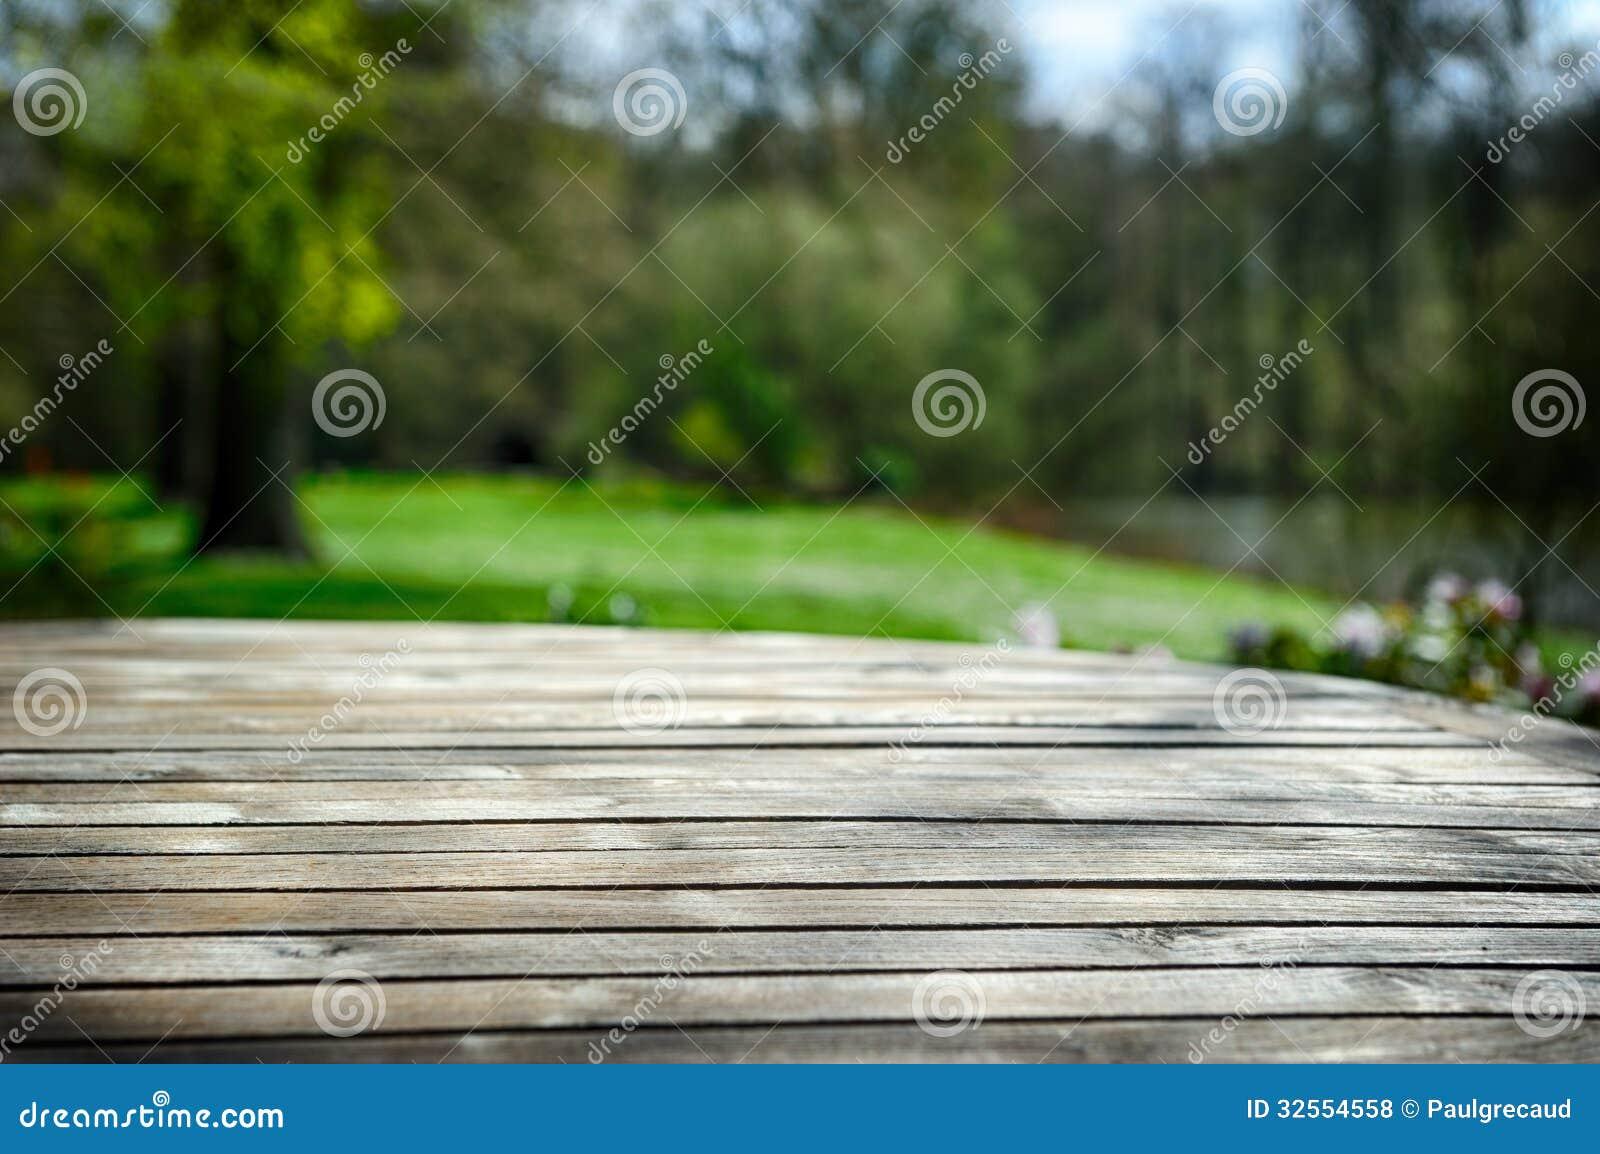 Empty wooden table in spring garden